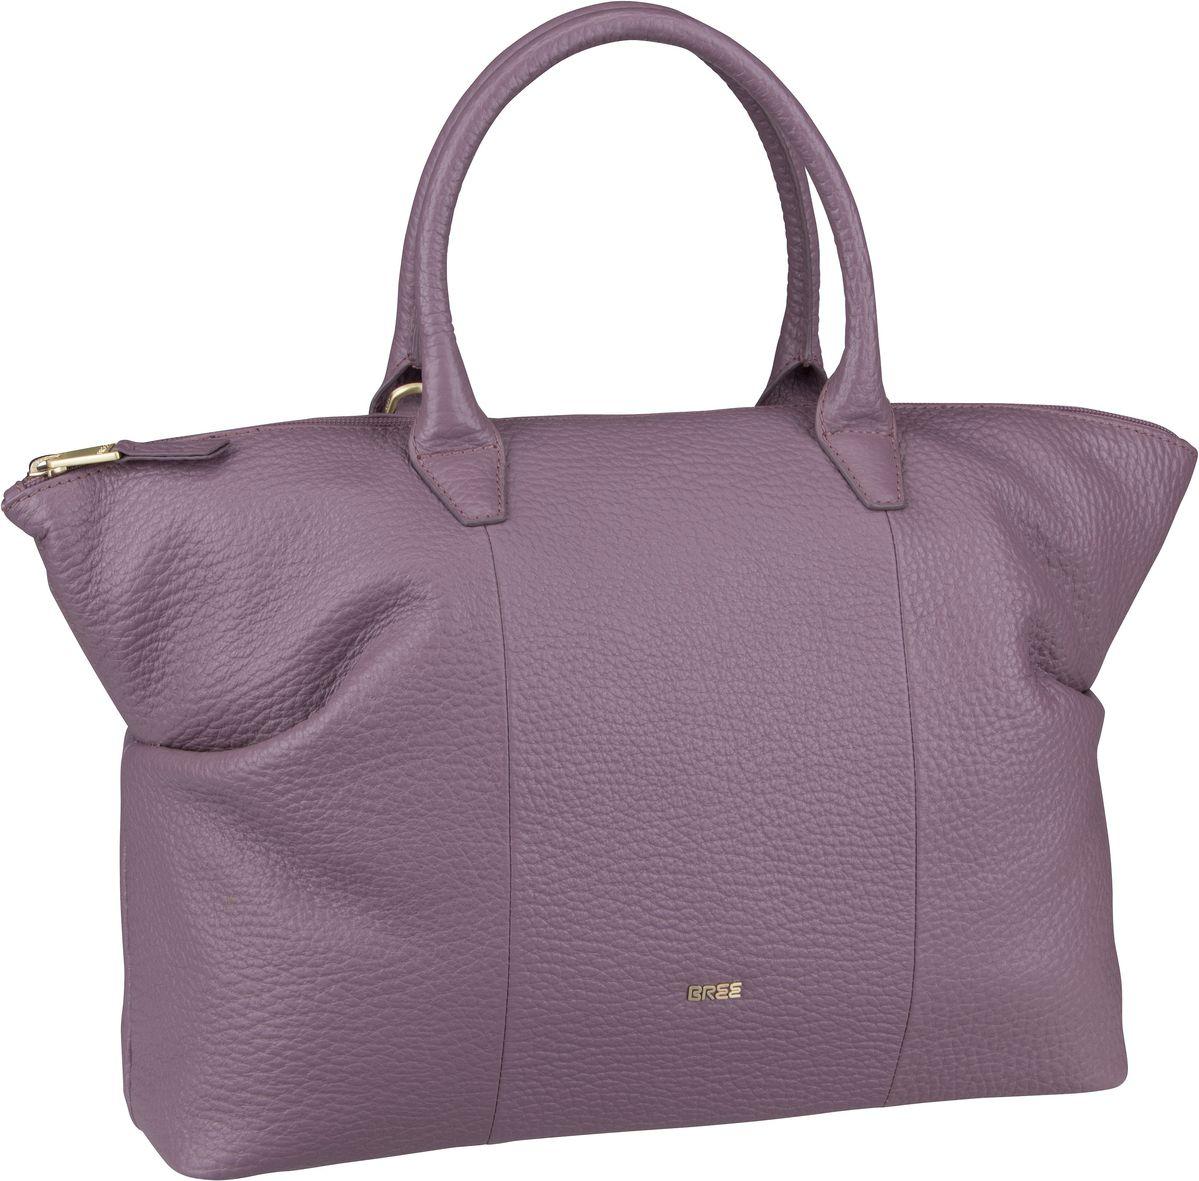 Handtasche Icon Bag Grape Shake